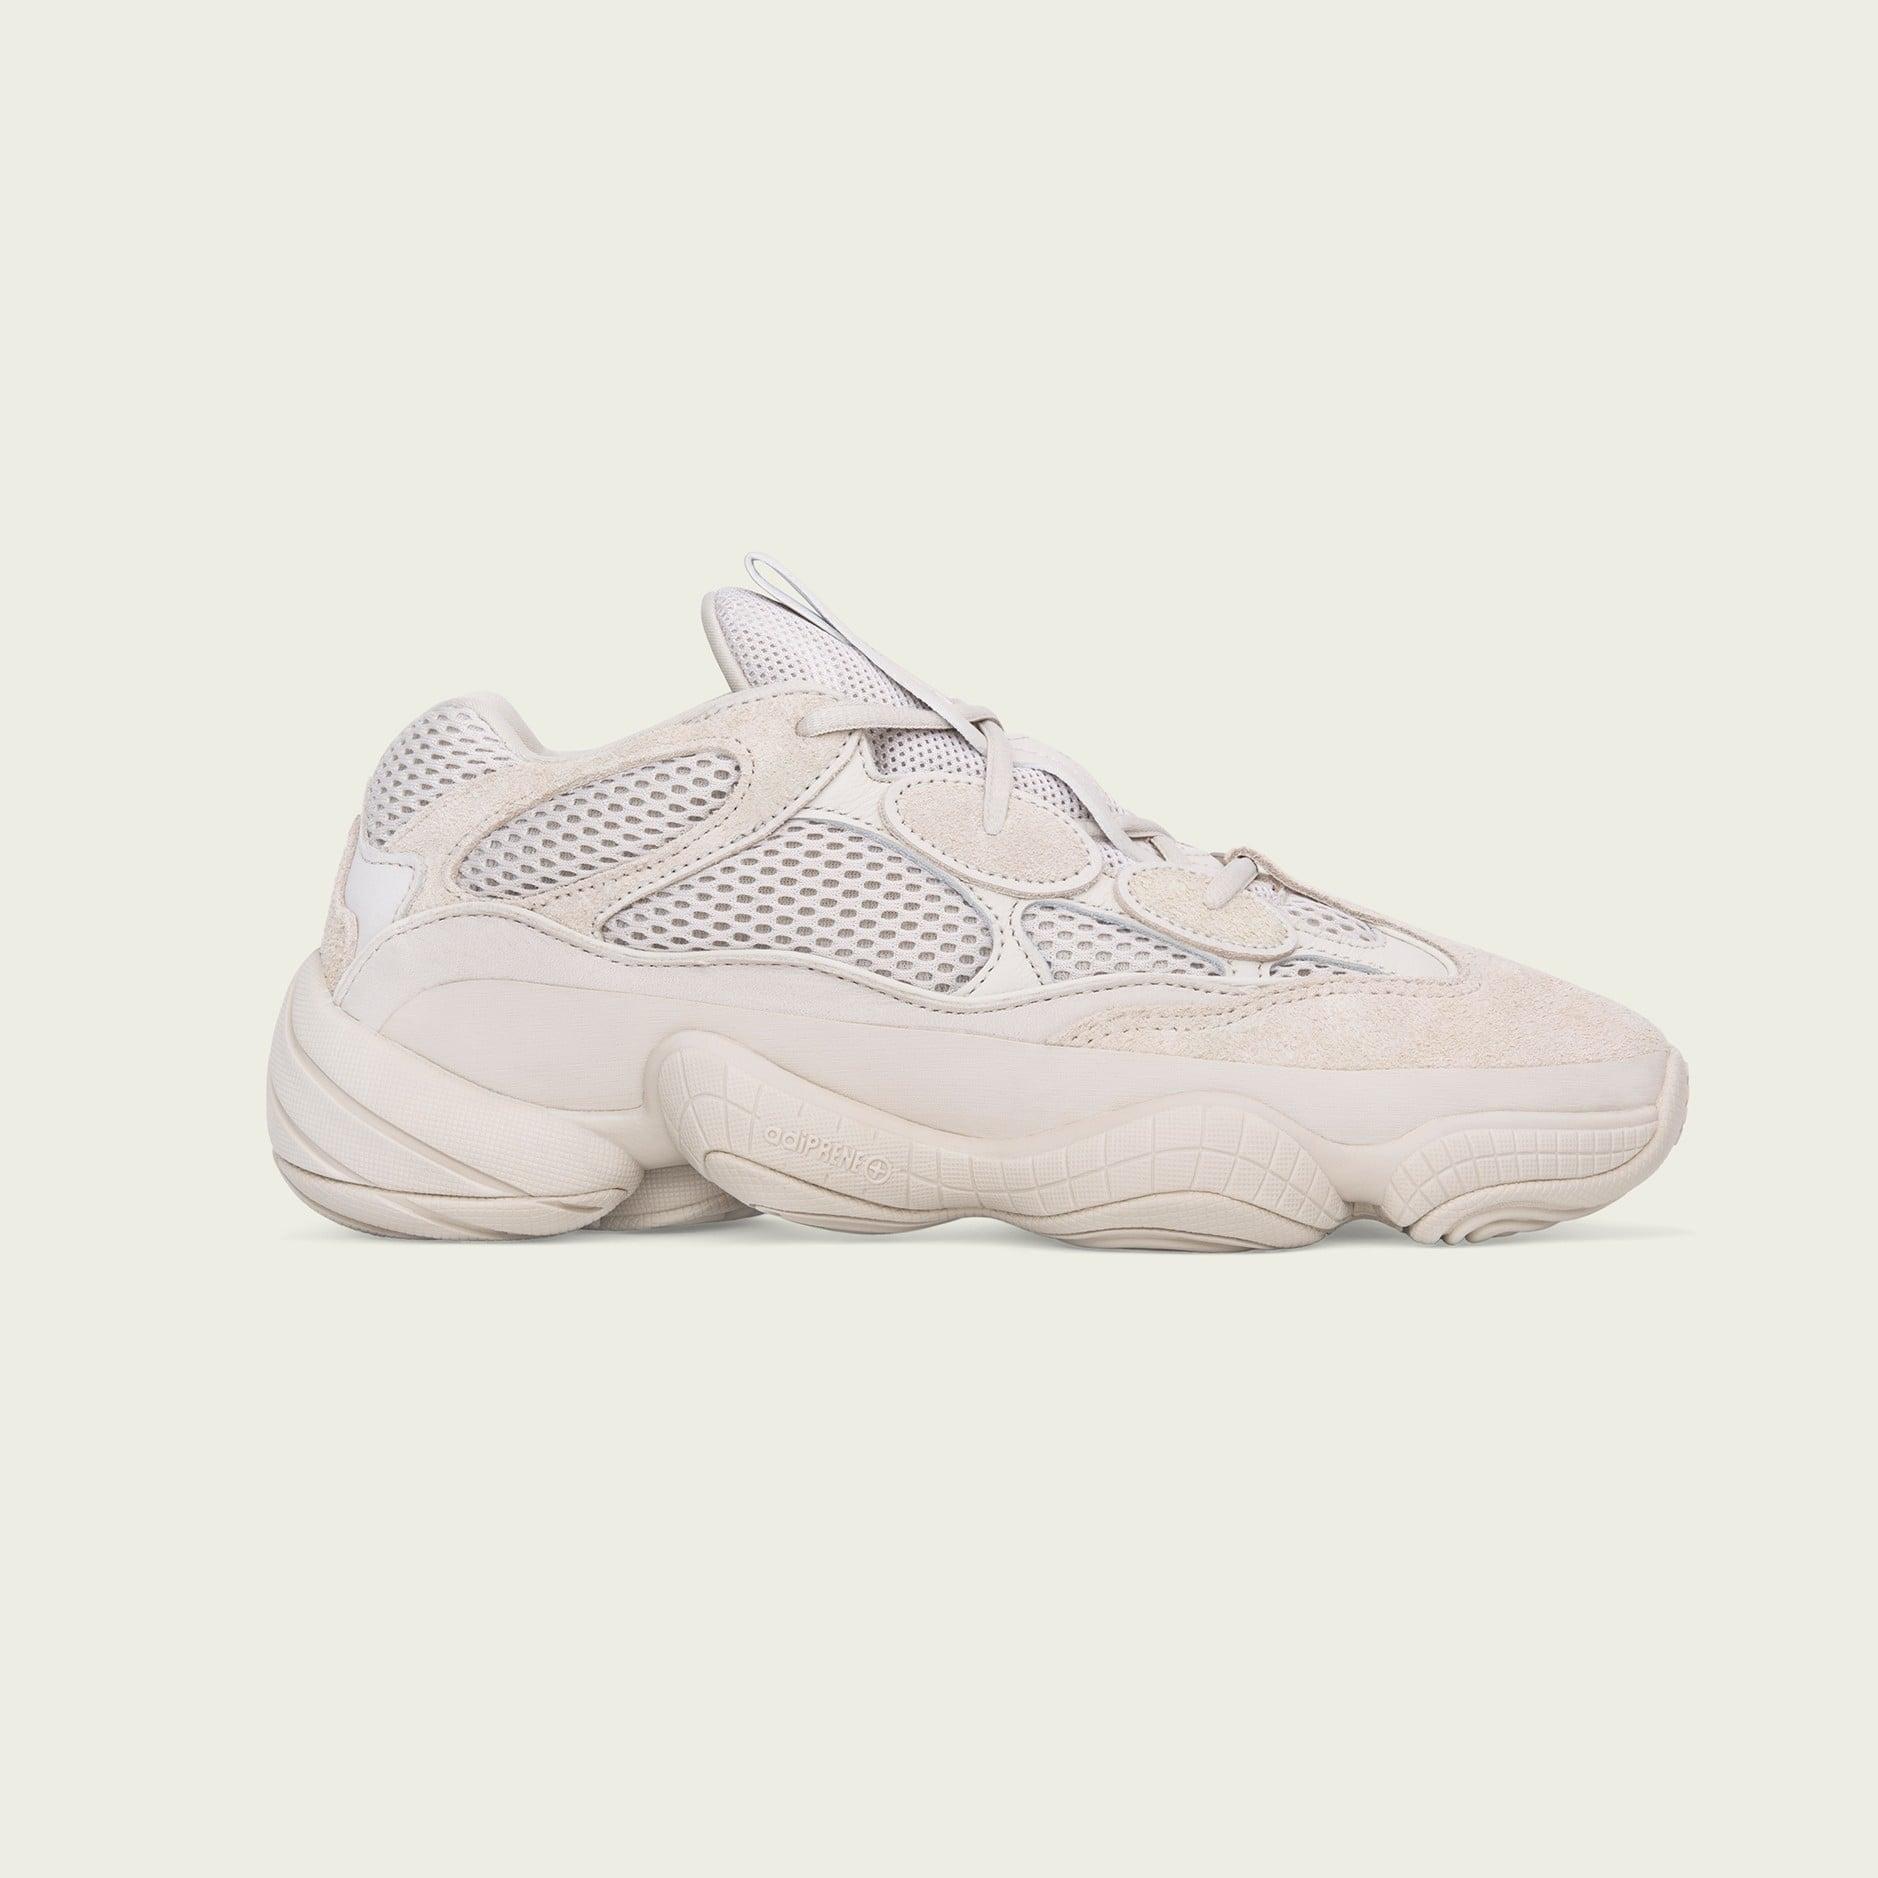 Kanye West x Adidas Yeezy 500 Blush Sneakers  POPSUGAR Fashi